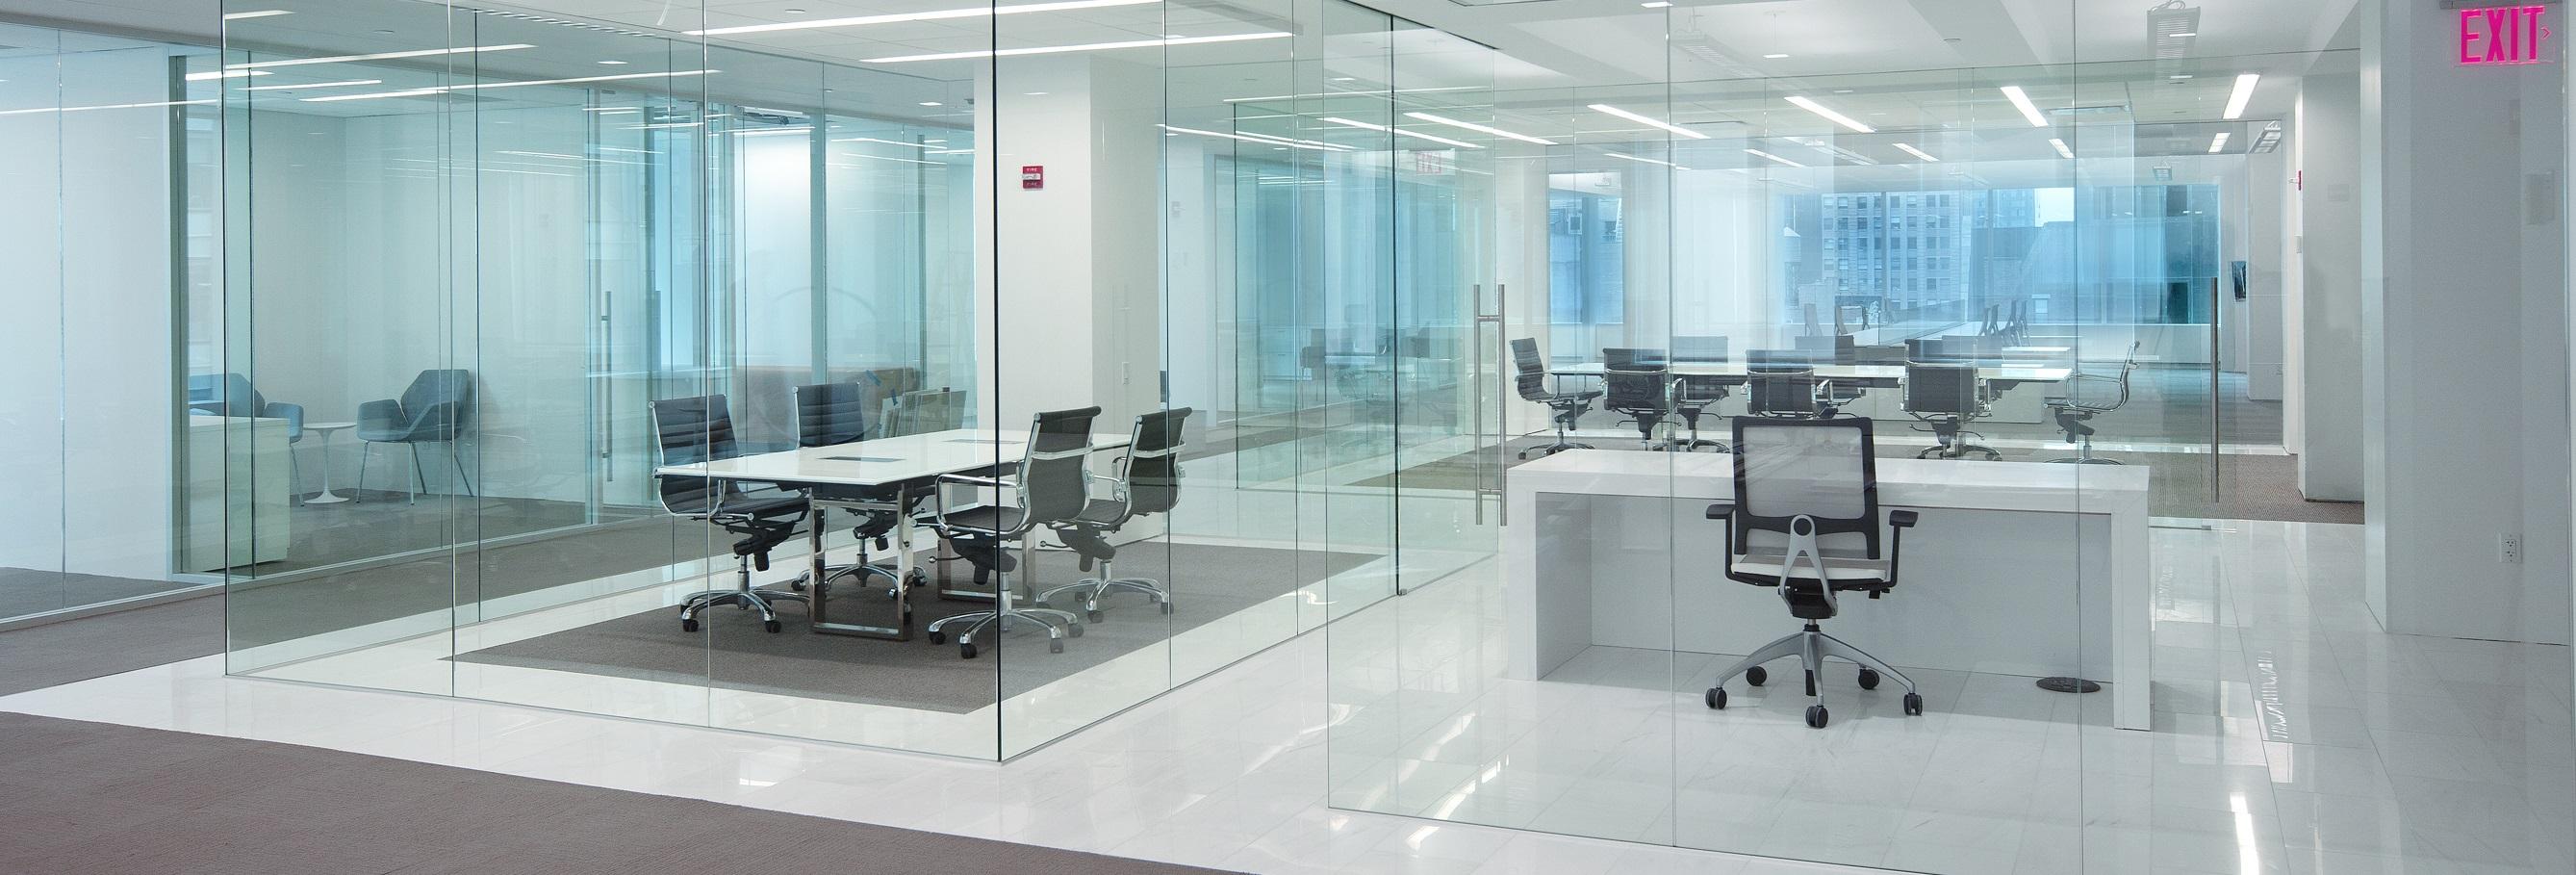 Dorma_Glass_Office_Walls_interior_technology-1